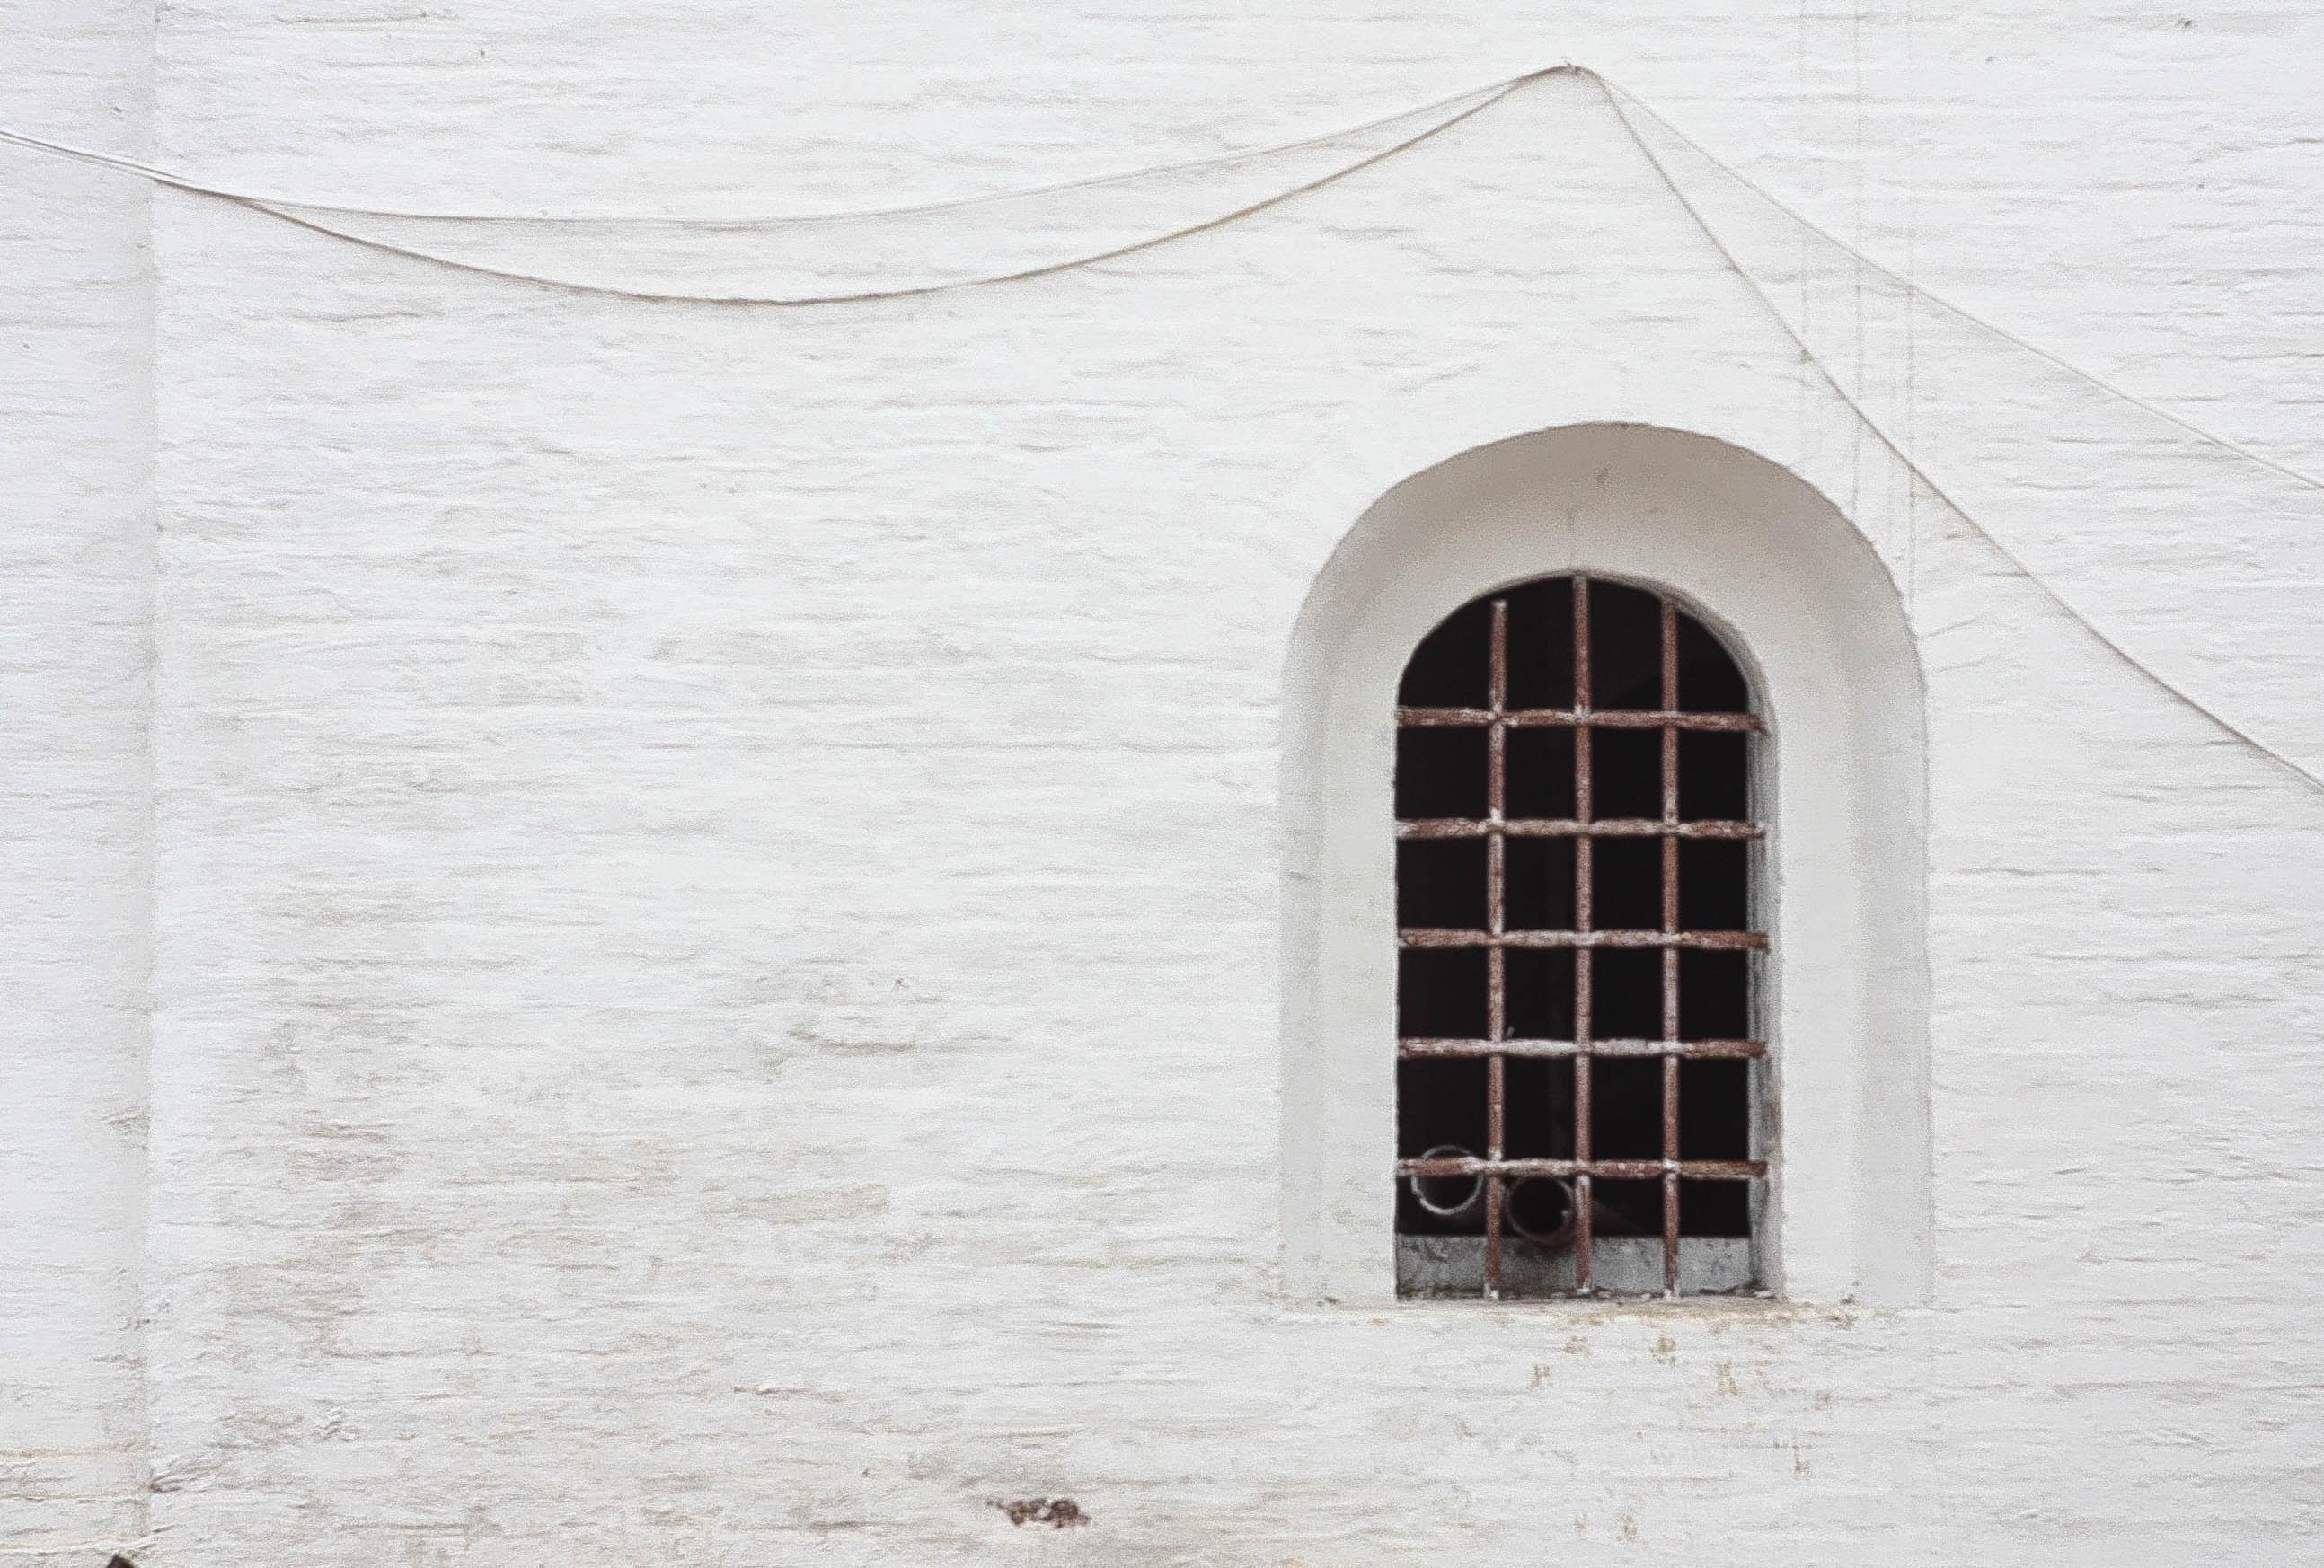 closeup photo of metal window